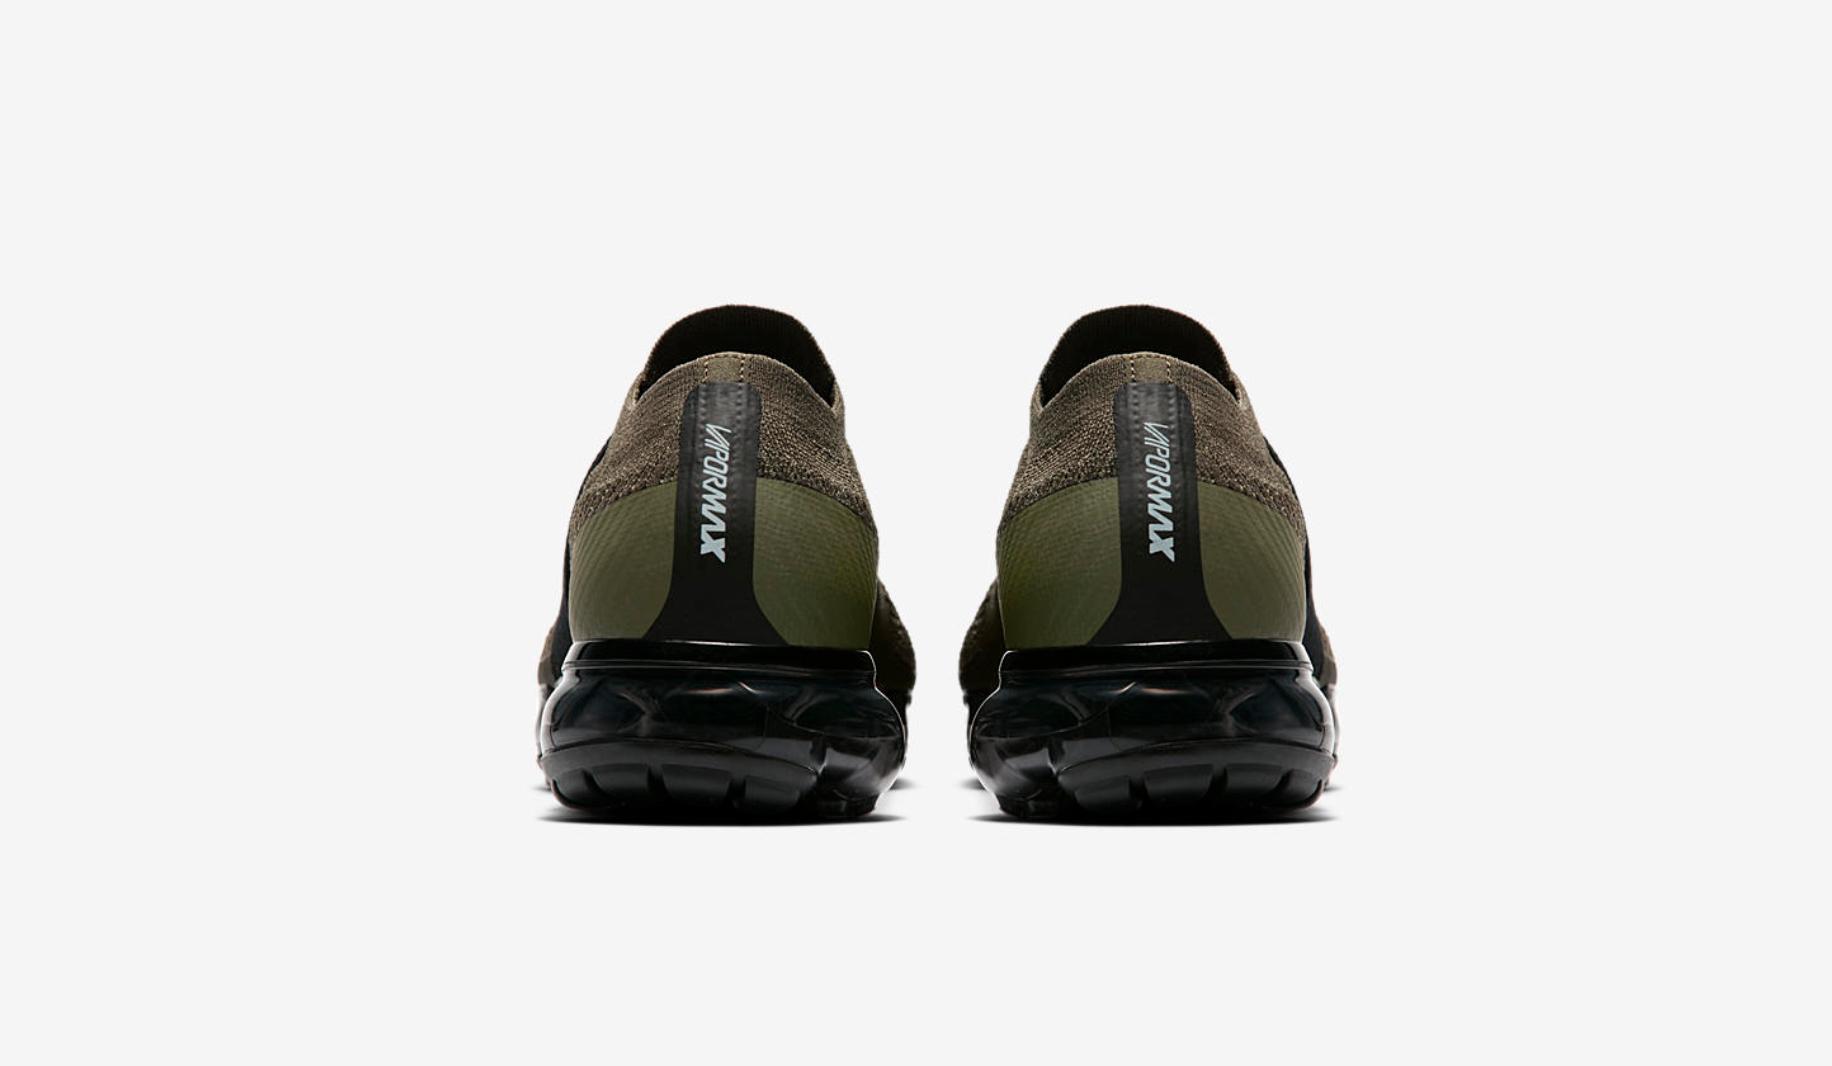 Nike Air Vapormax Flyknit Moc Gjennomgang vsCwbOz